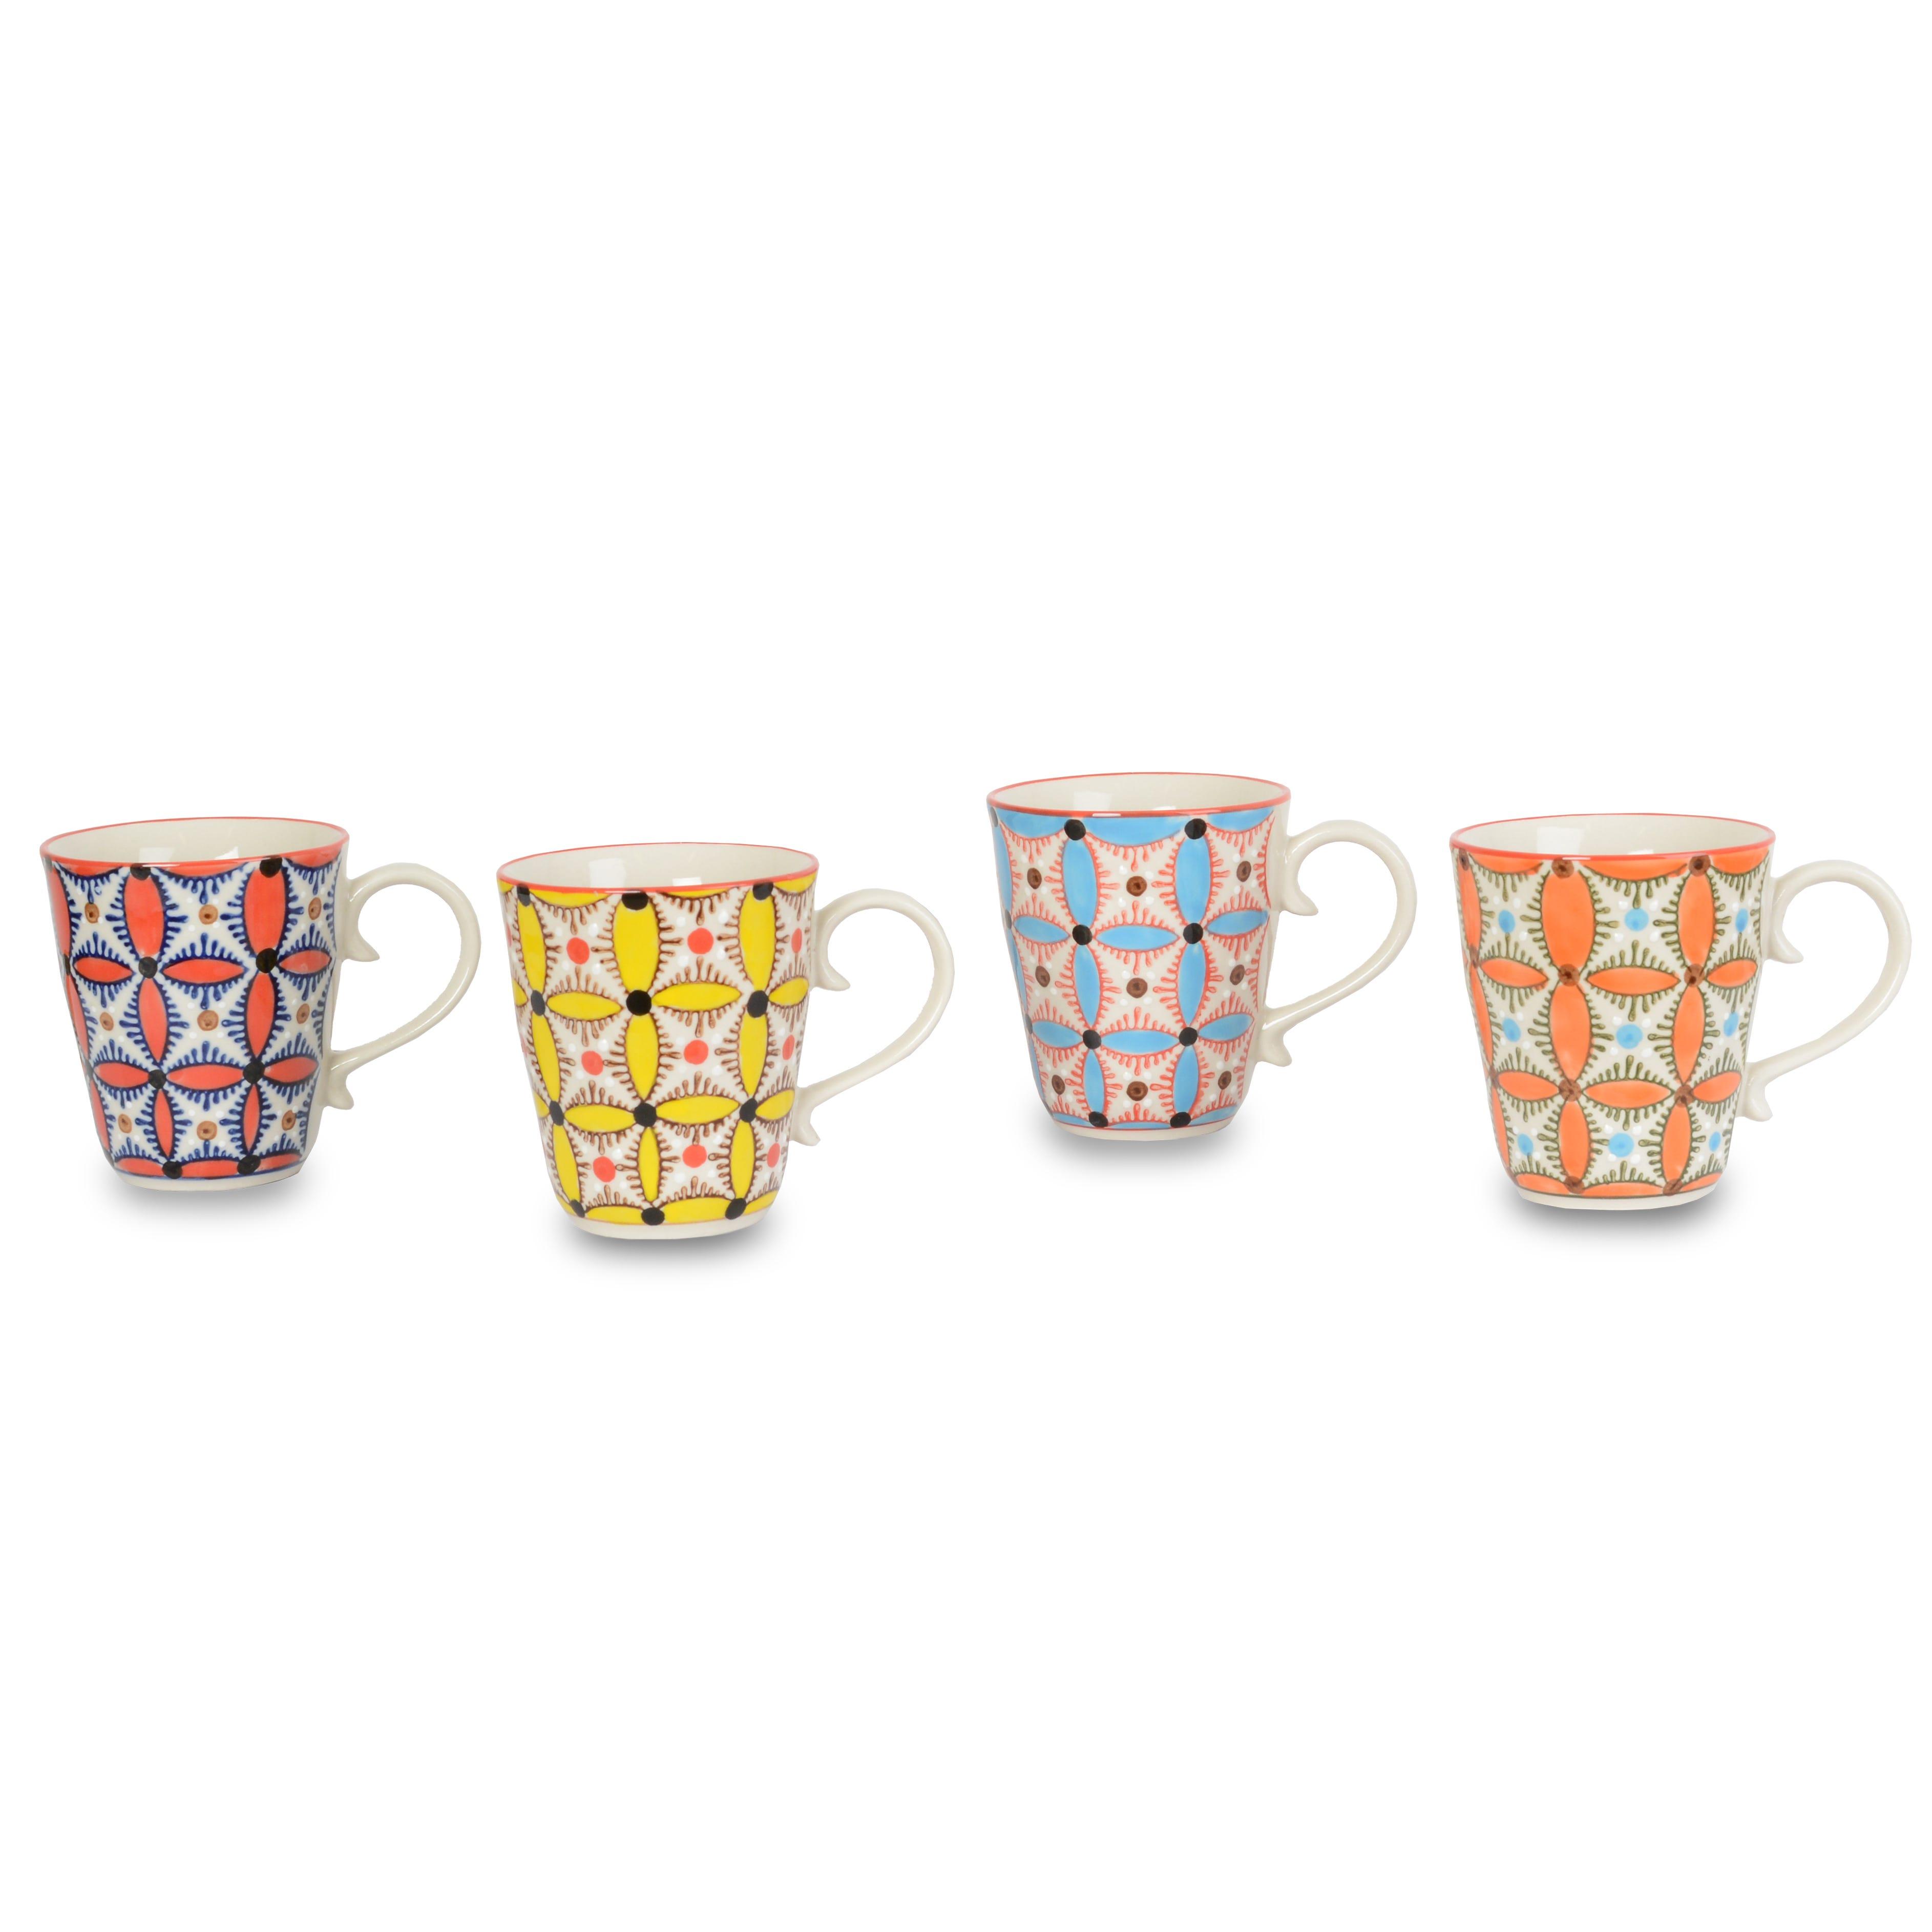 Hippy Mugs Assorted Set of 4